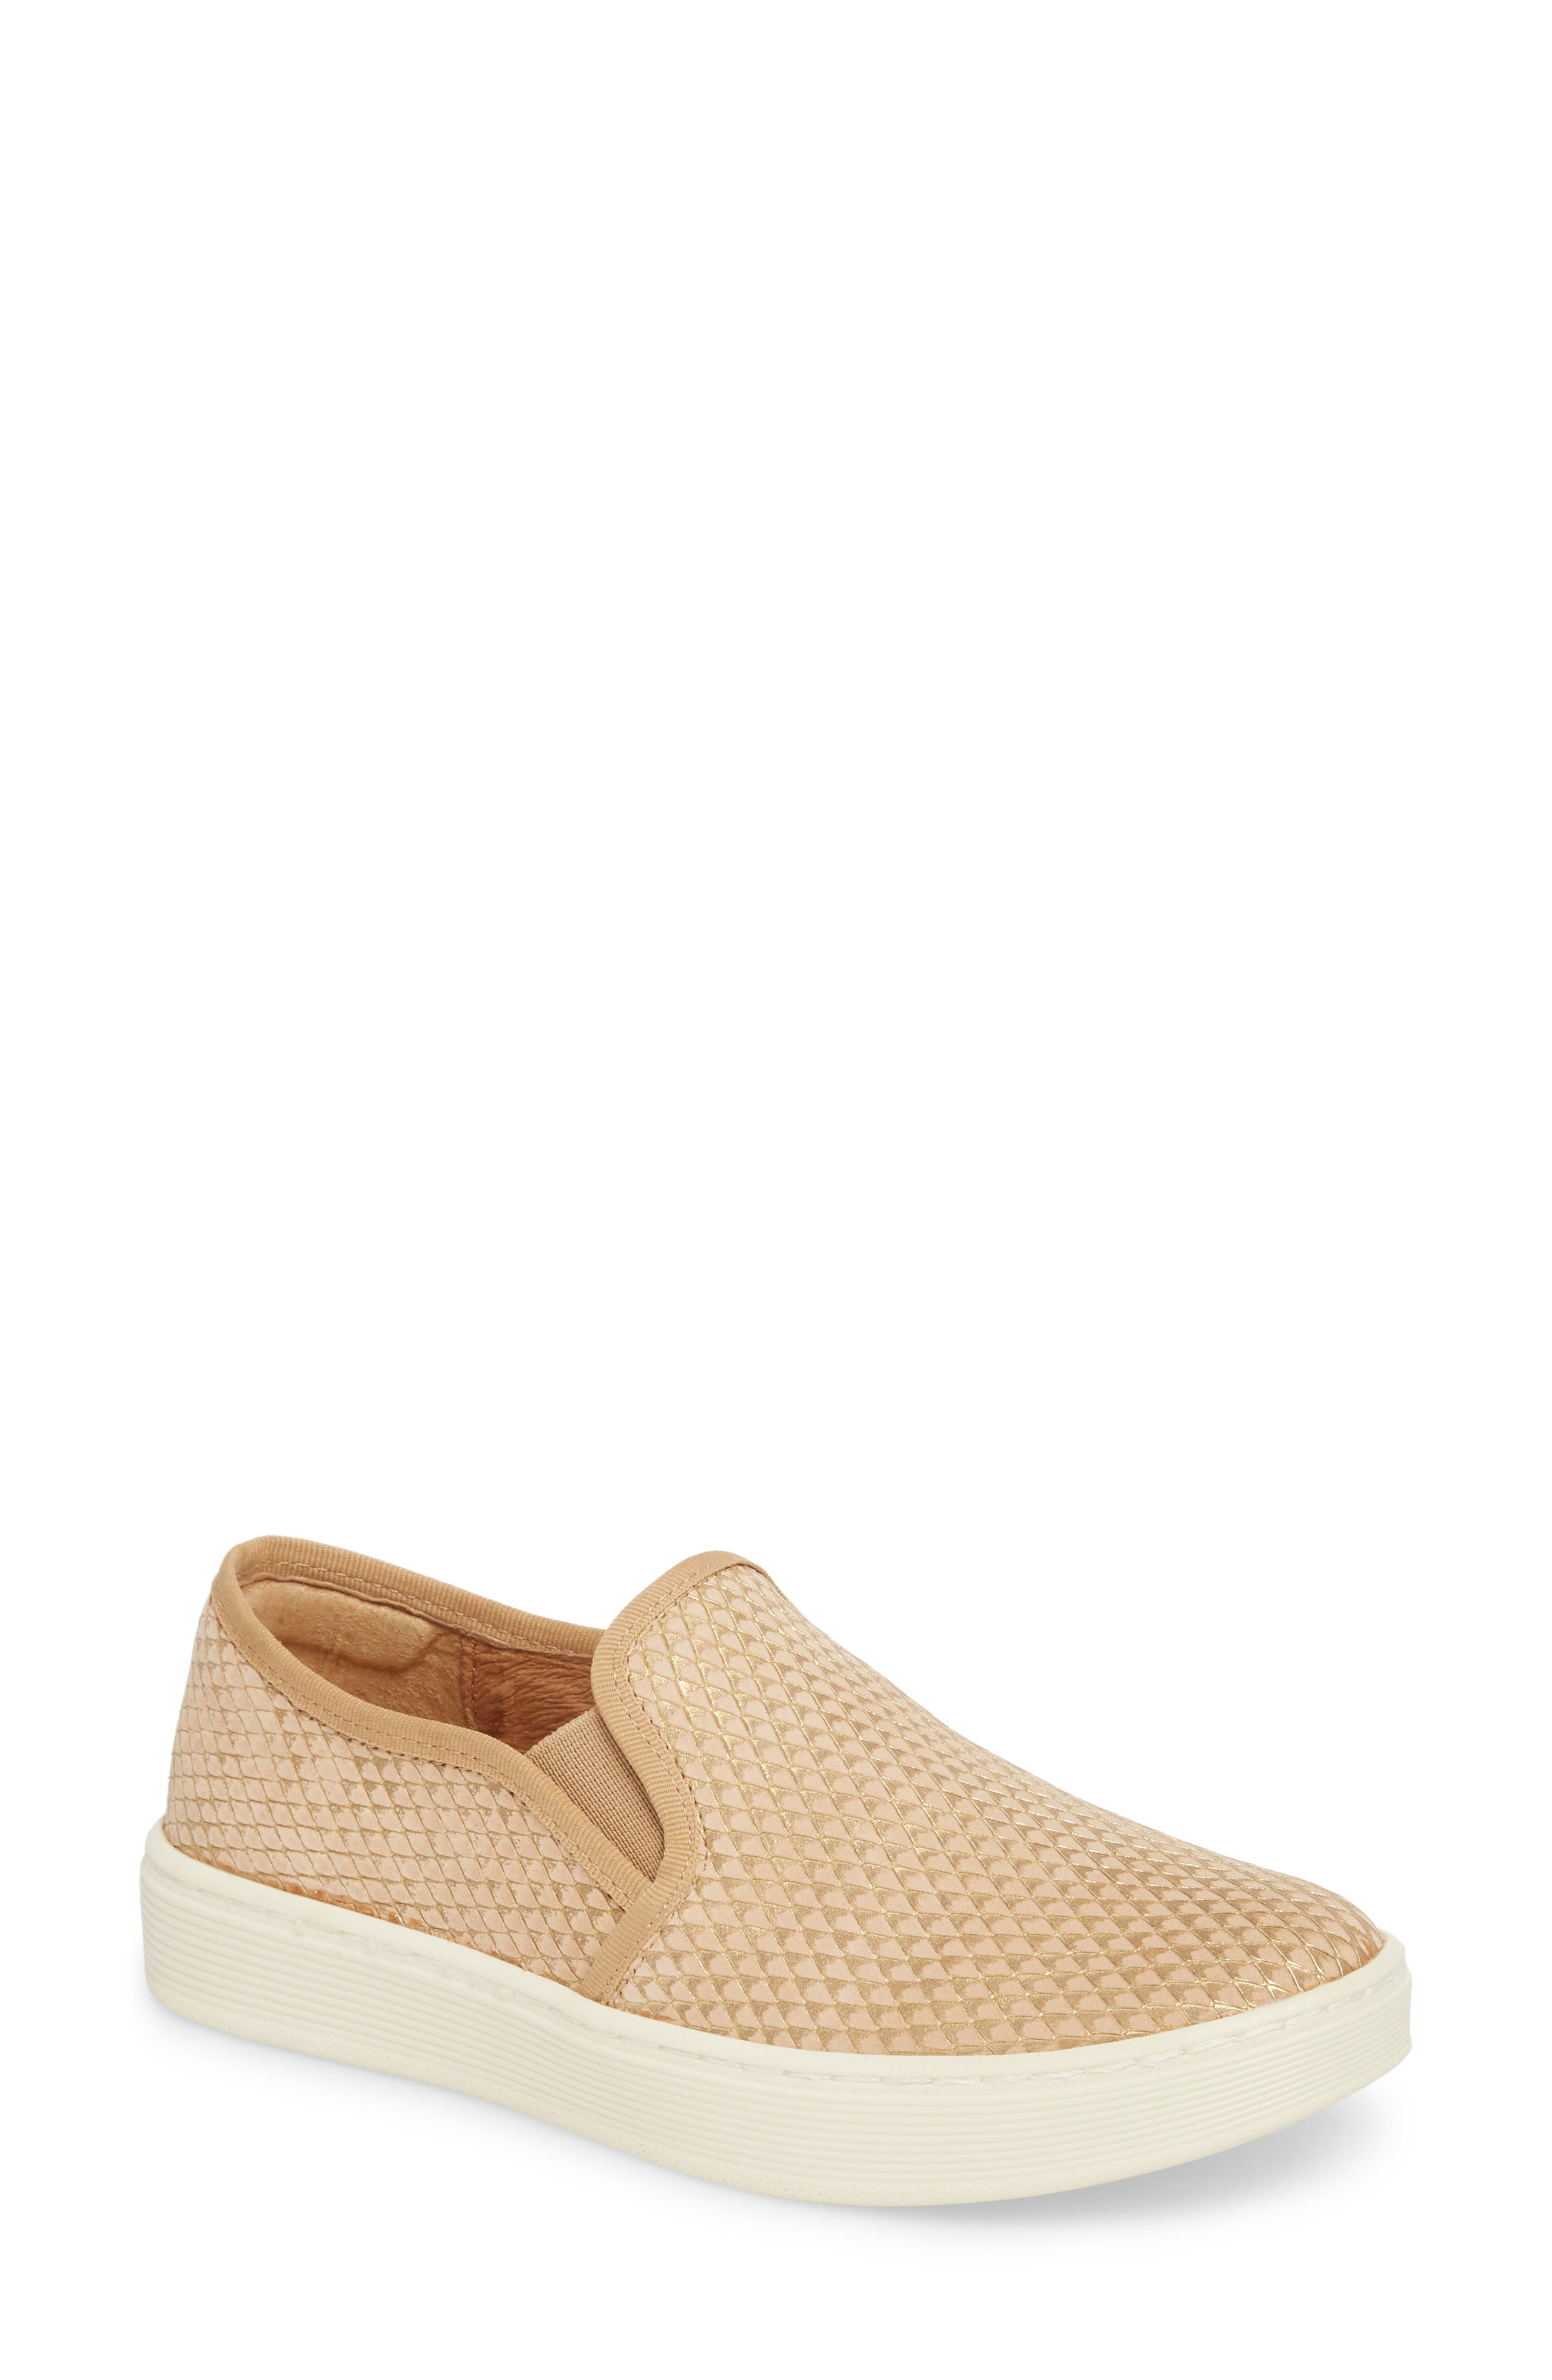 'Somers' Slip-On Sneaker,                         Main,                         color, SAND NUBUCK